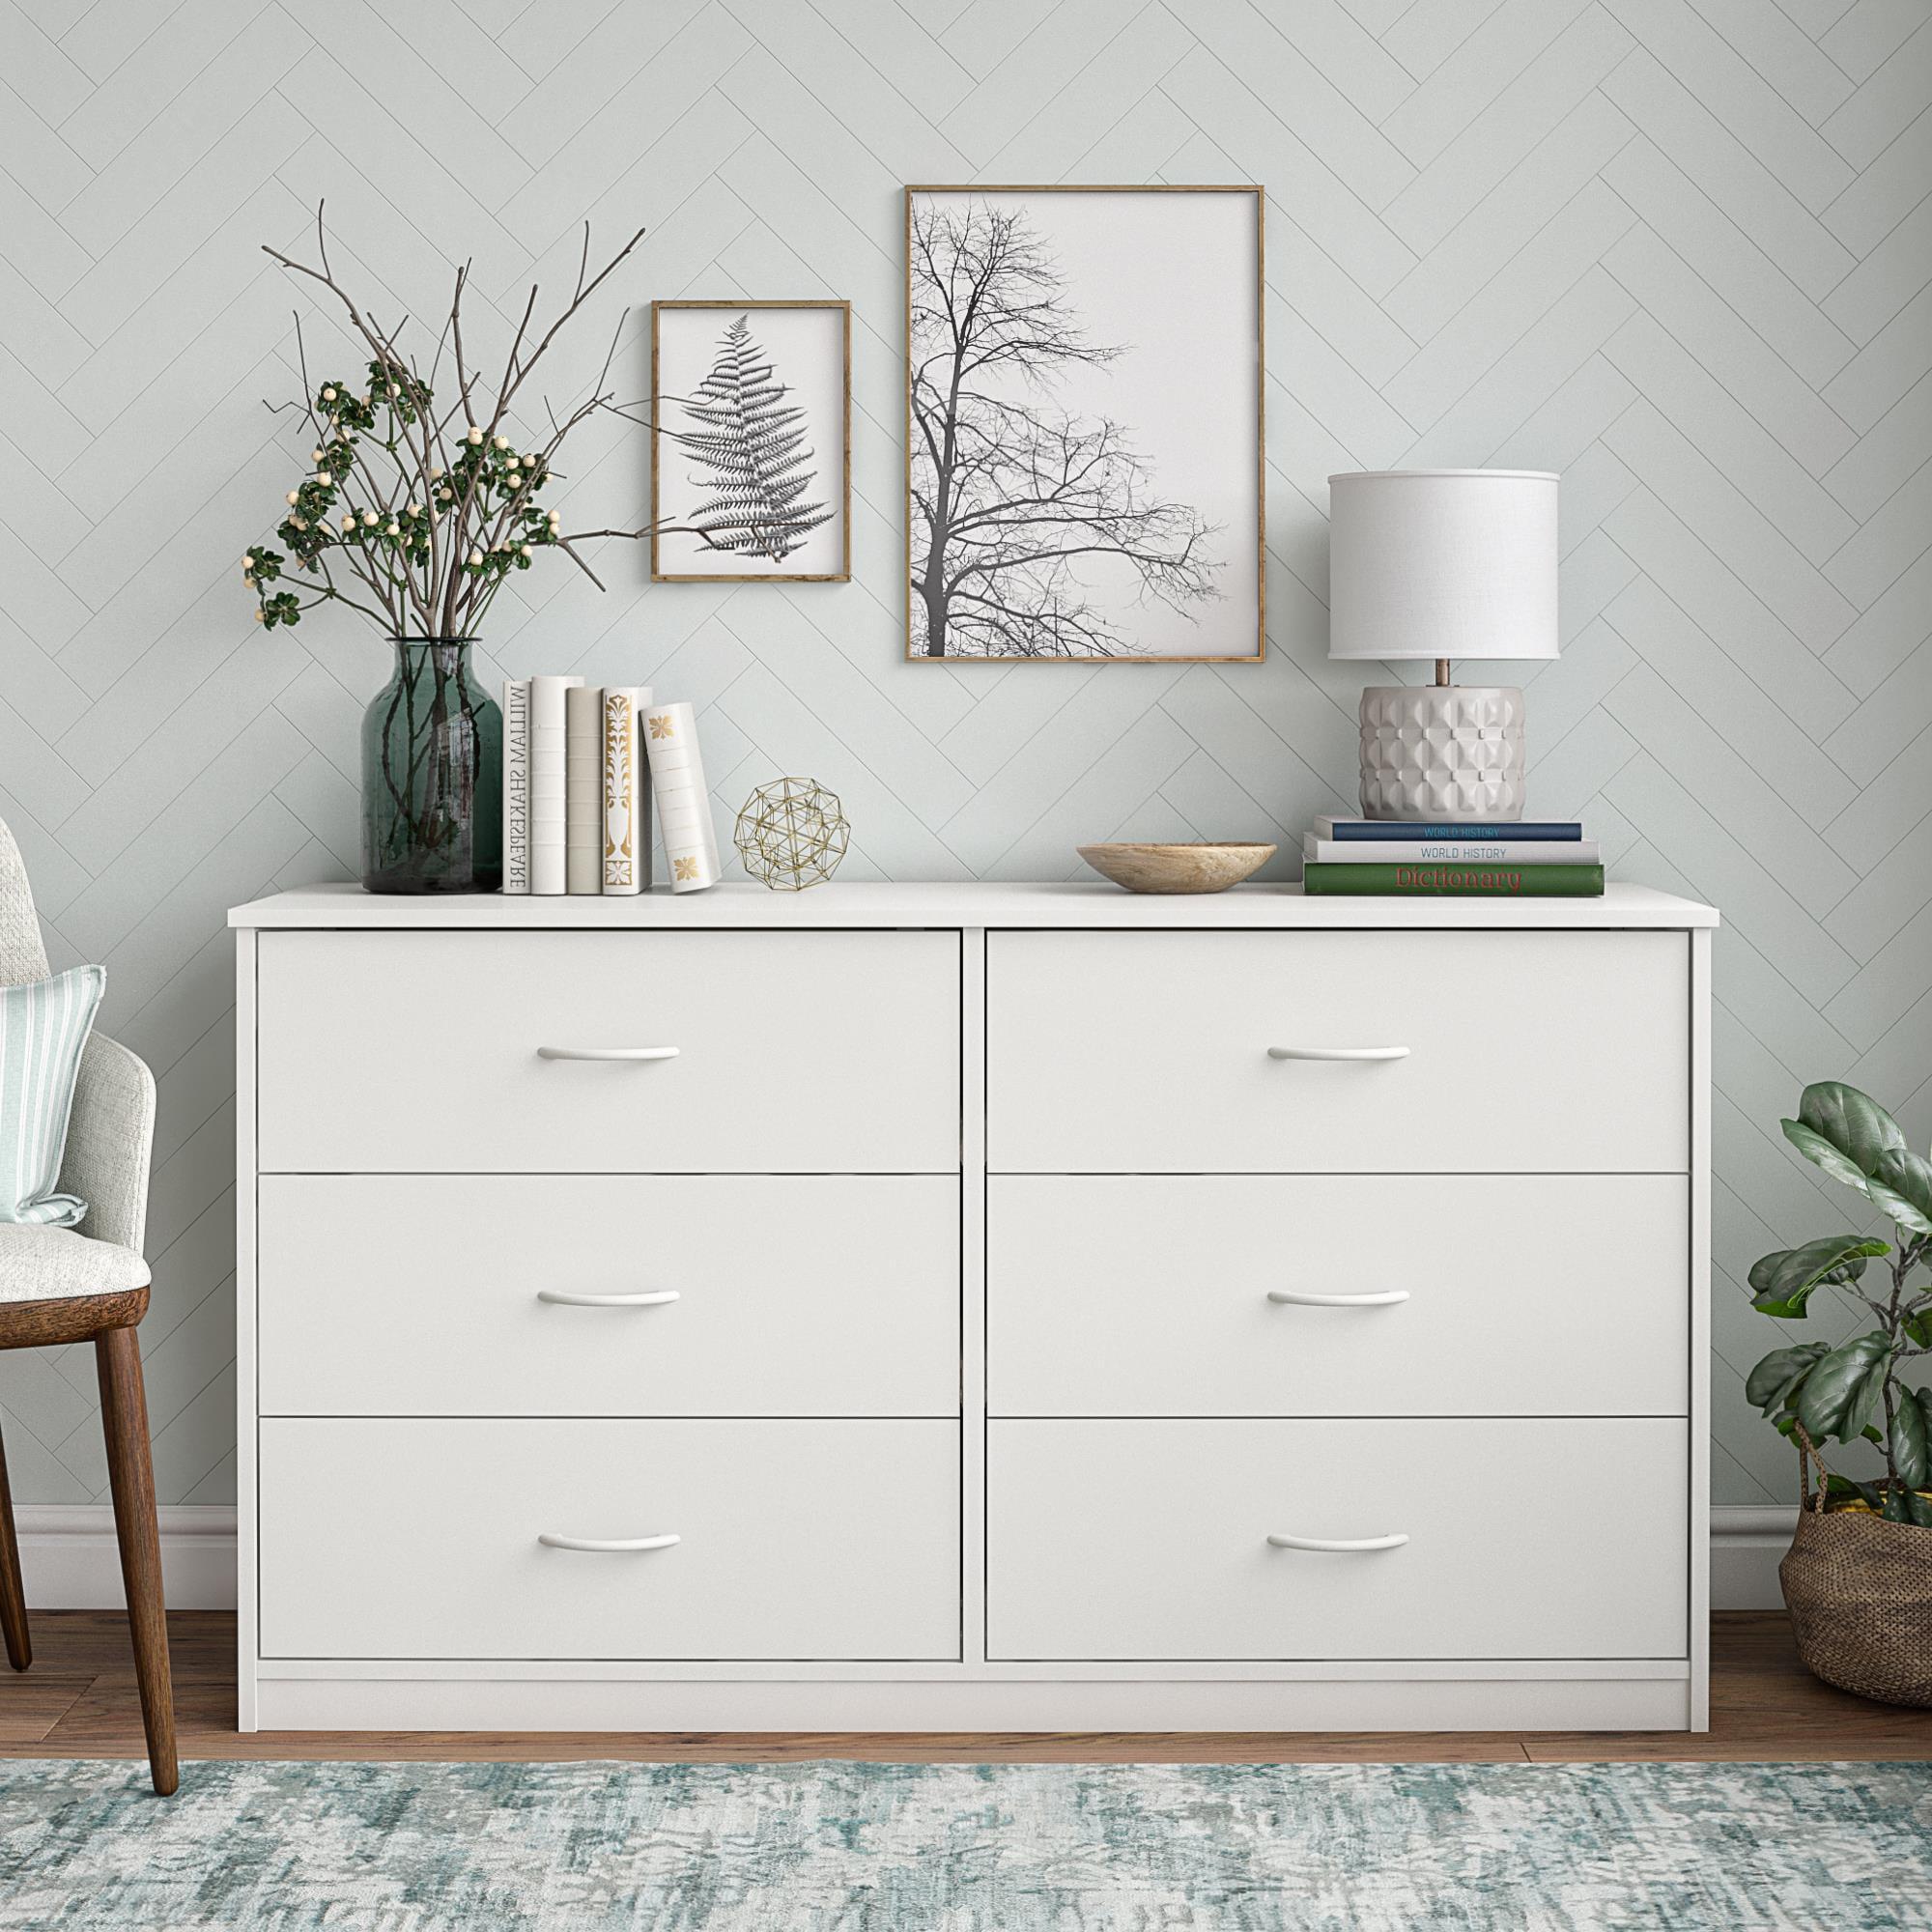 Mainstays Classic 6 Drawer Dresser, White Finish - Walmart.com